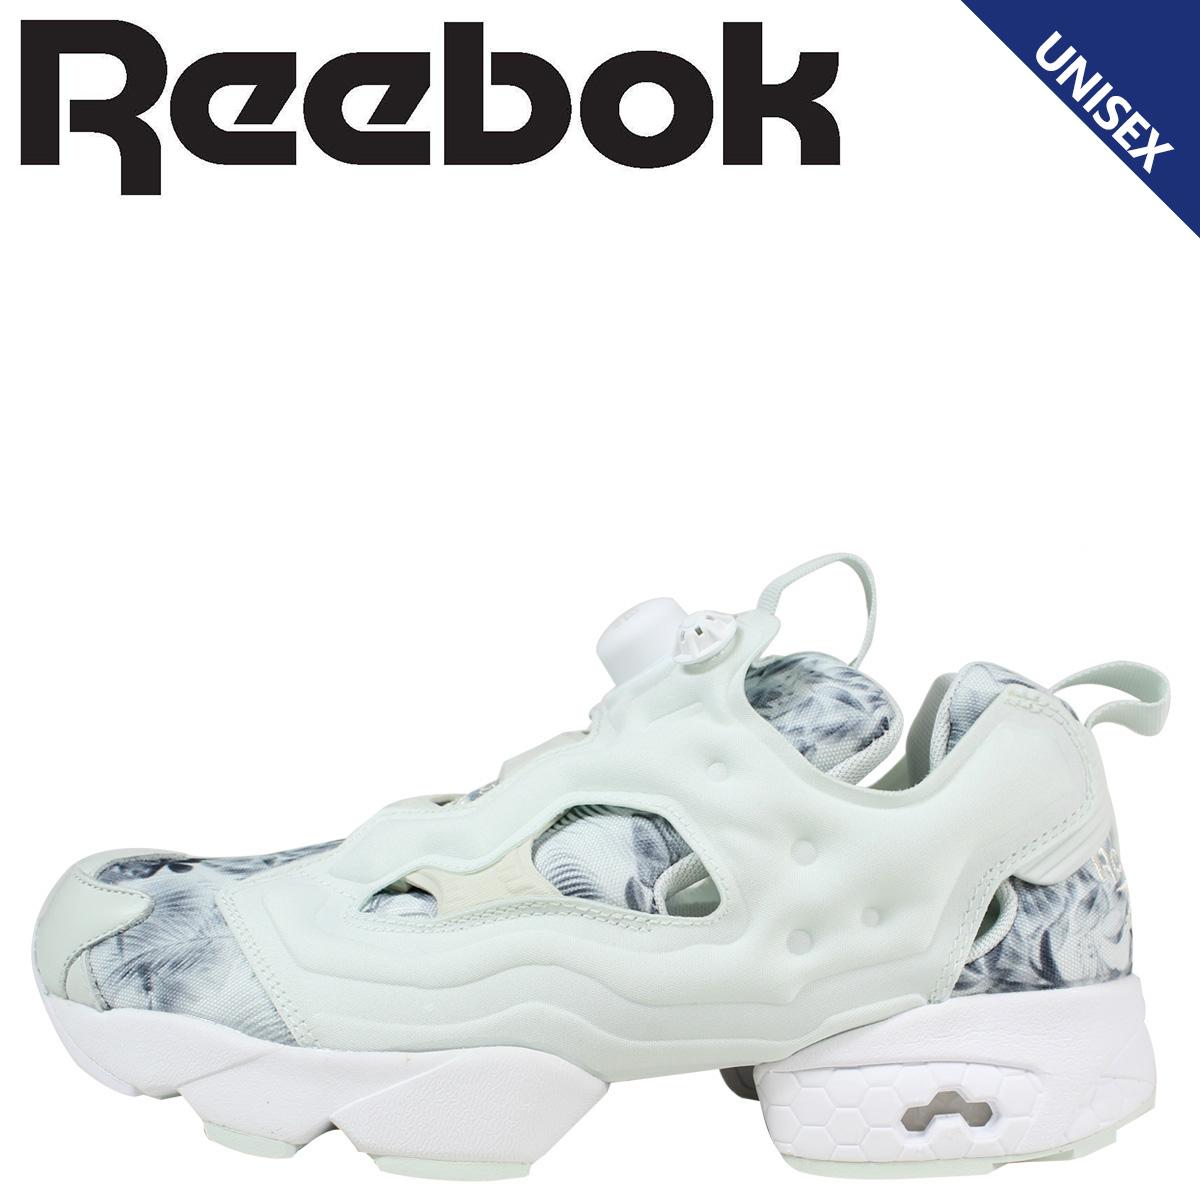 4a94cddf669b18 ALLSPORTS  Reebok Reebok pump fury sneakers INSTAPUMP FURY SG V69989 ...